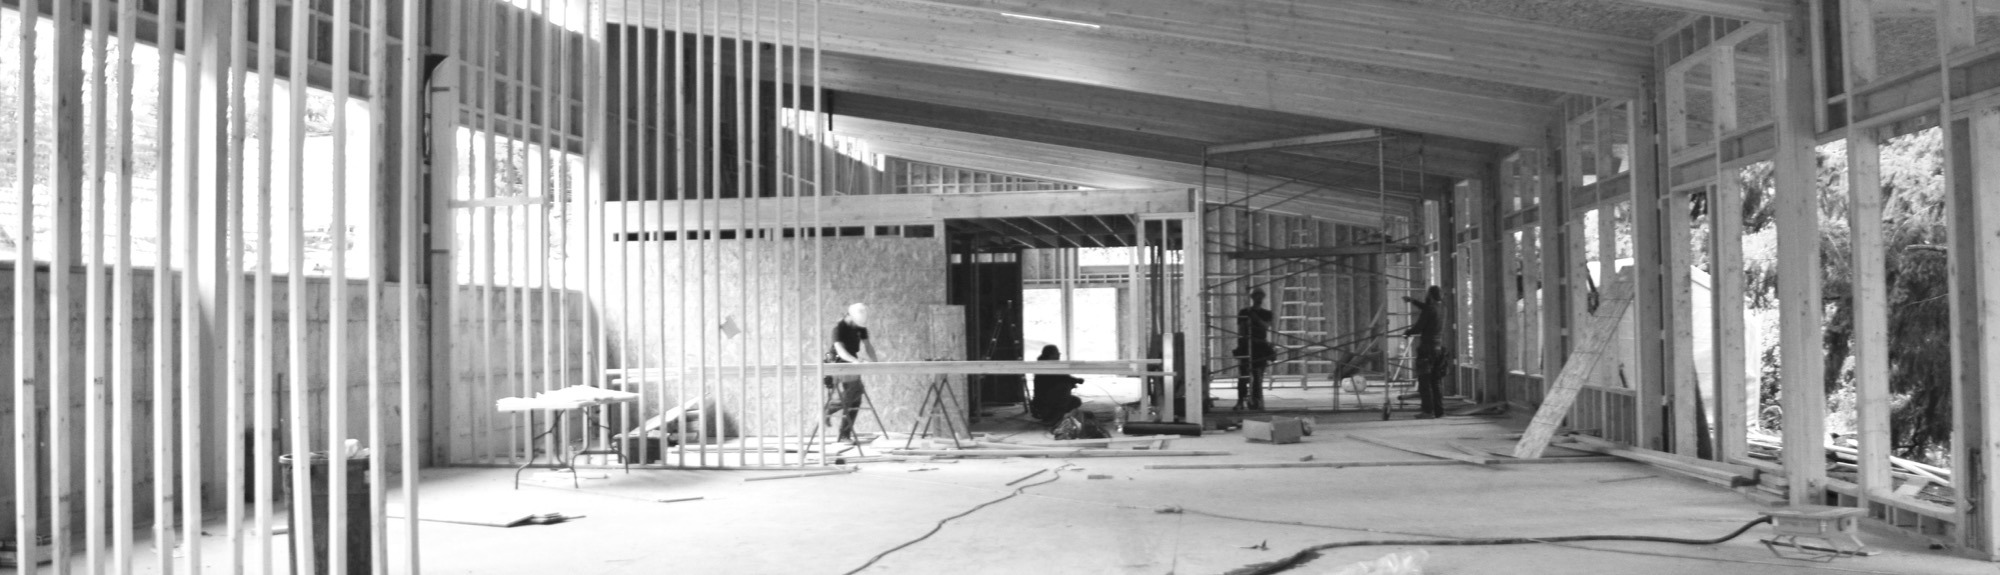 Attic building construction